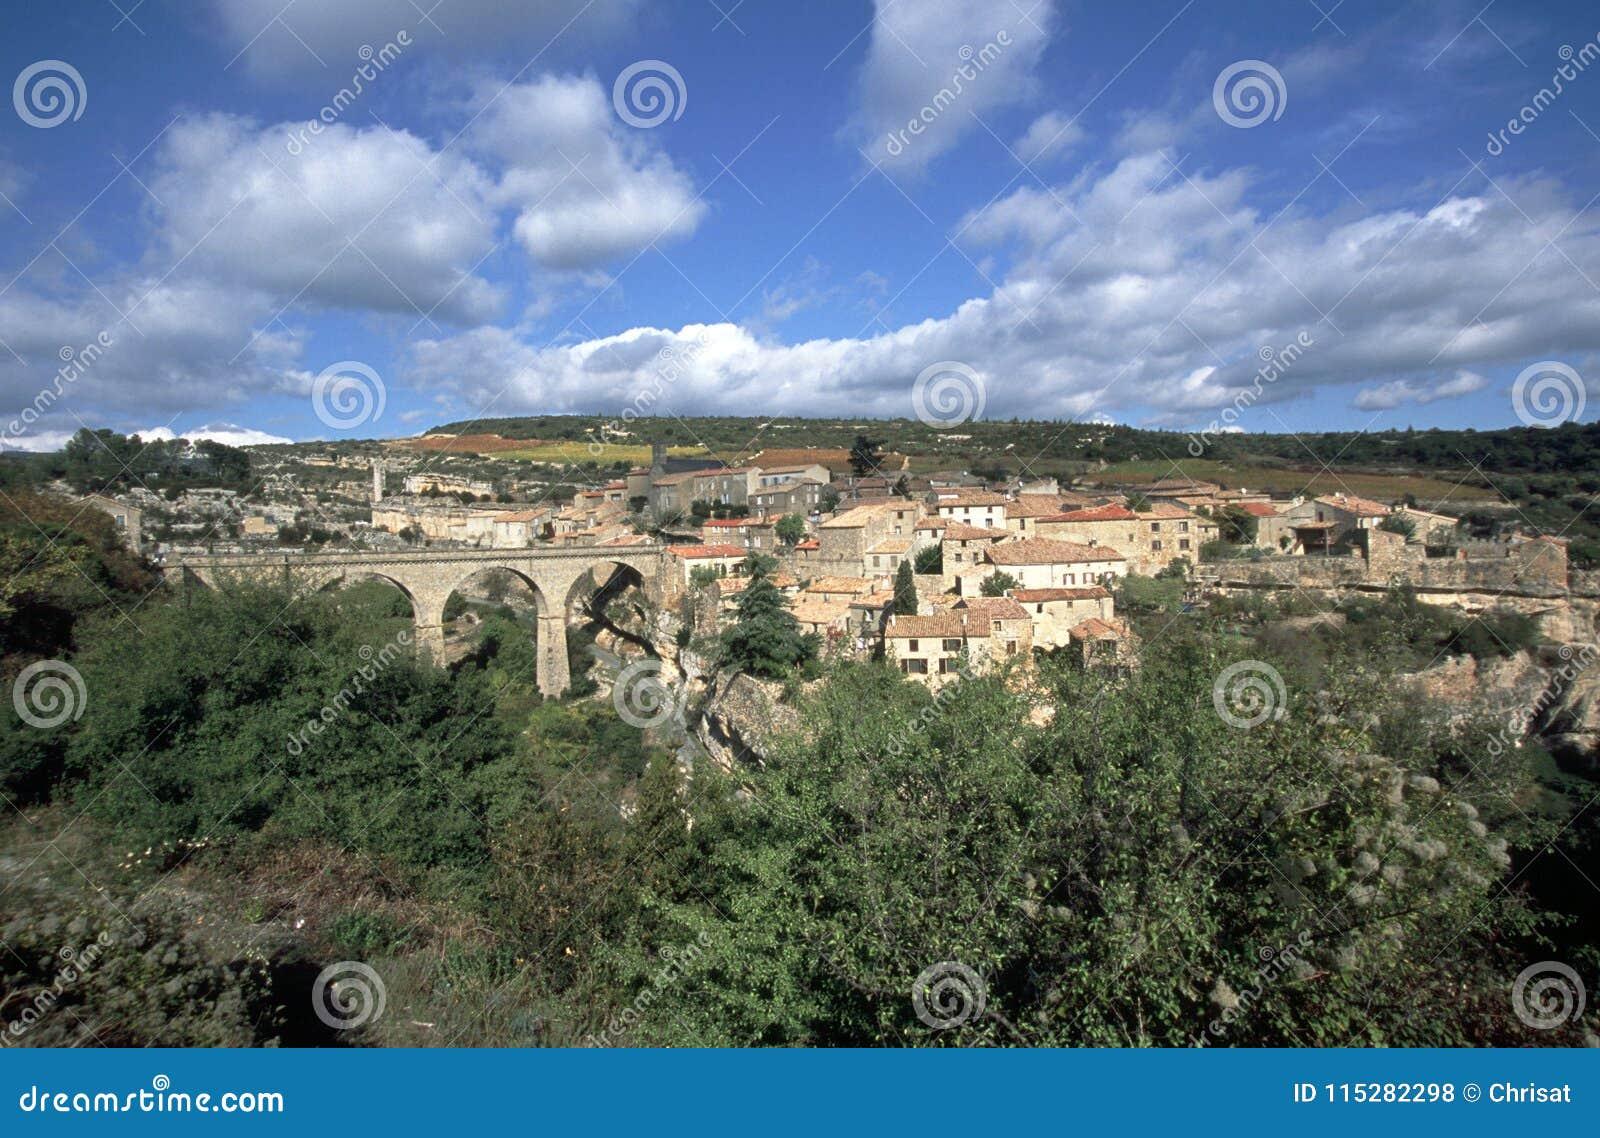 France, Herault, Minerve